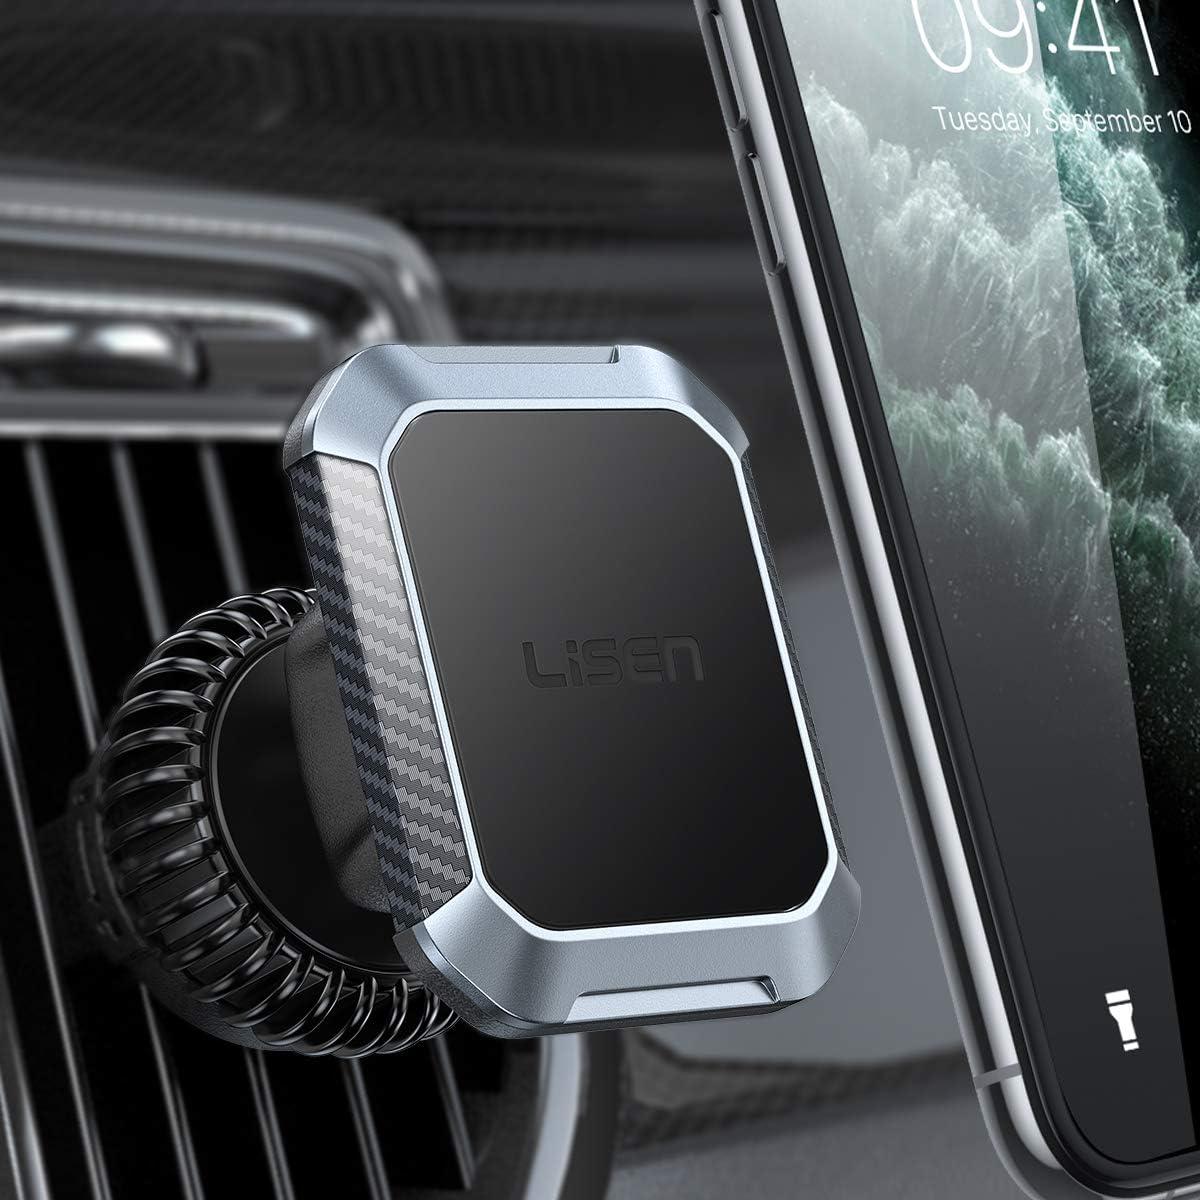 Best phone mounts for vertical vents, linsen vertical vents phone holder